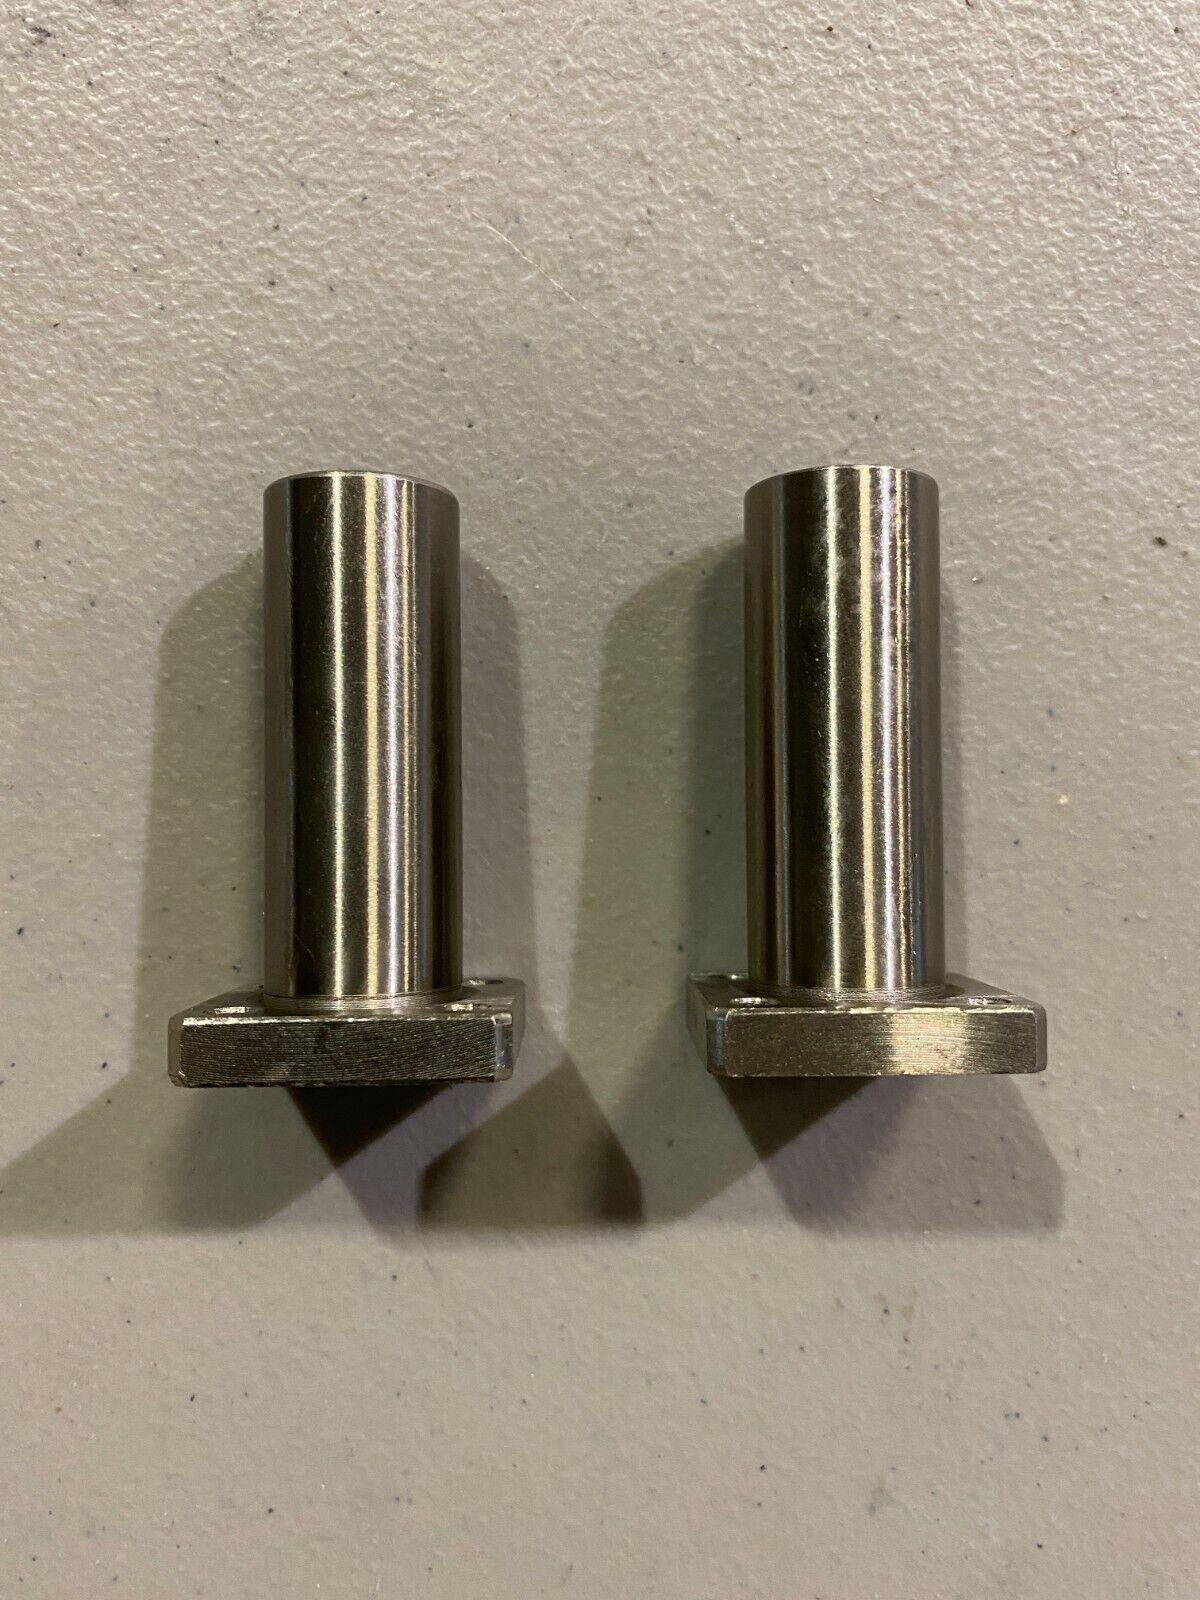 LMK10LUU - Bearings - Set of 2 - Qidi Tech 1